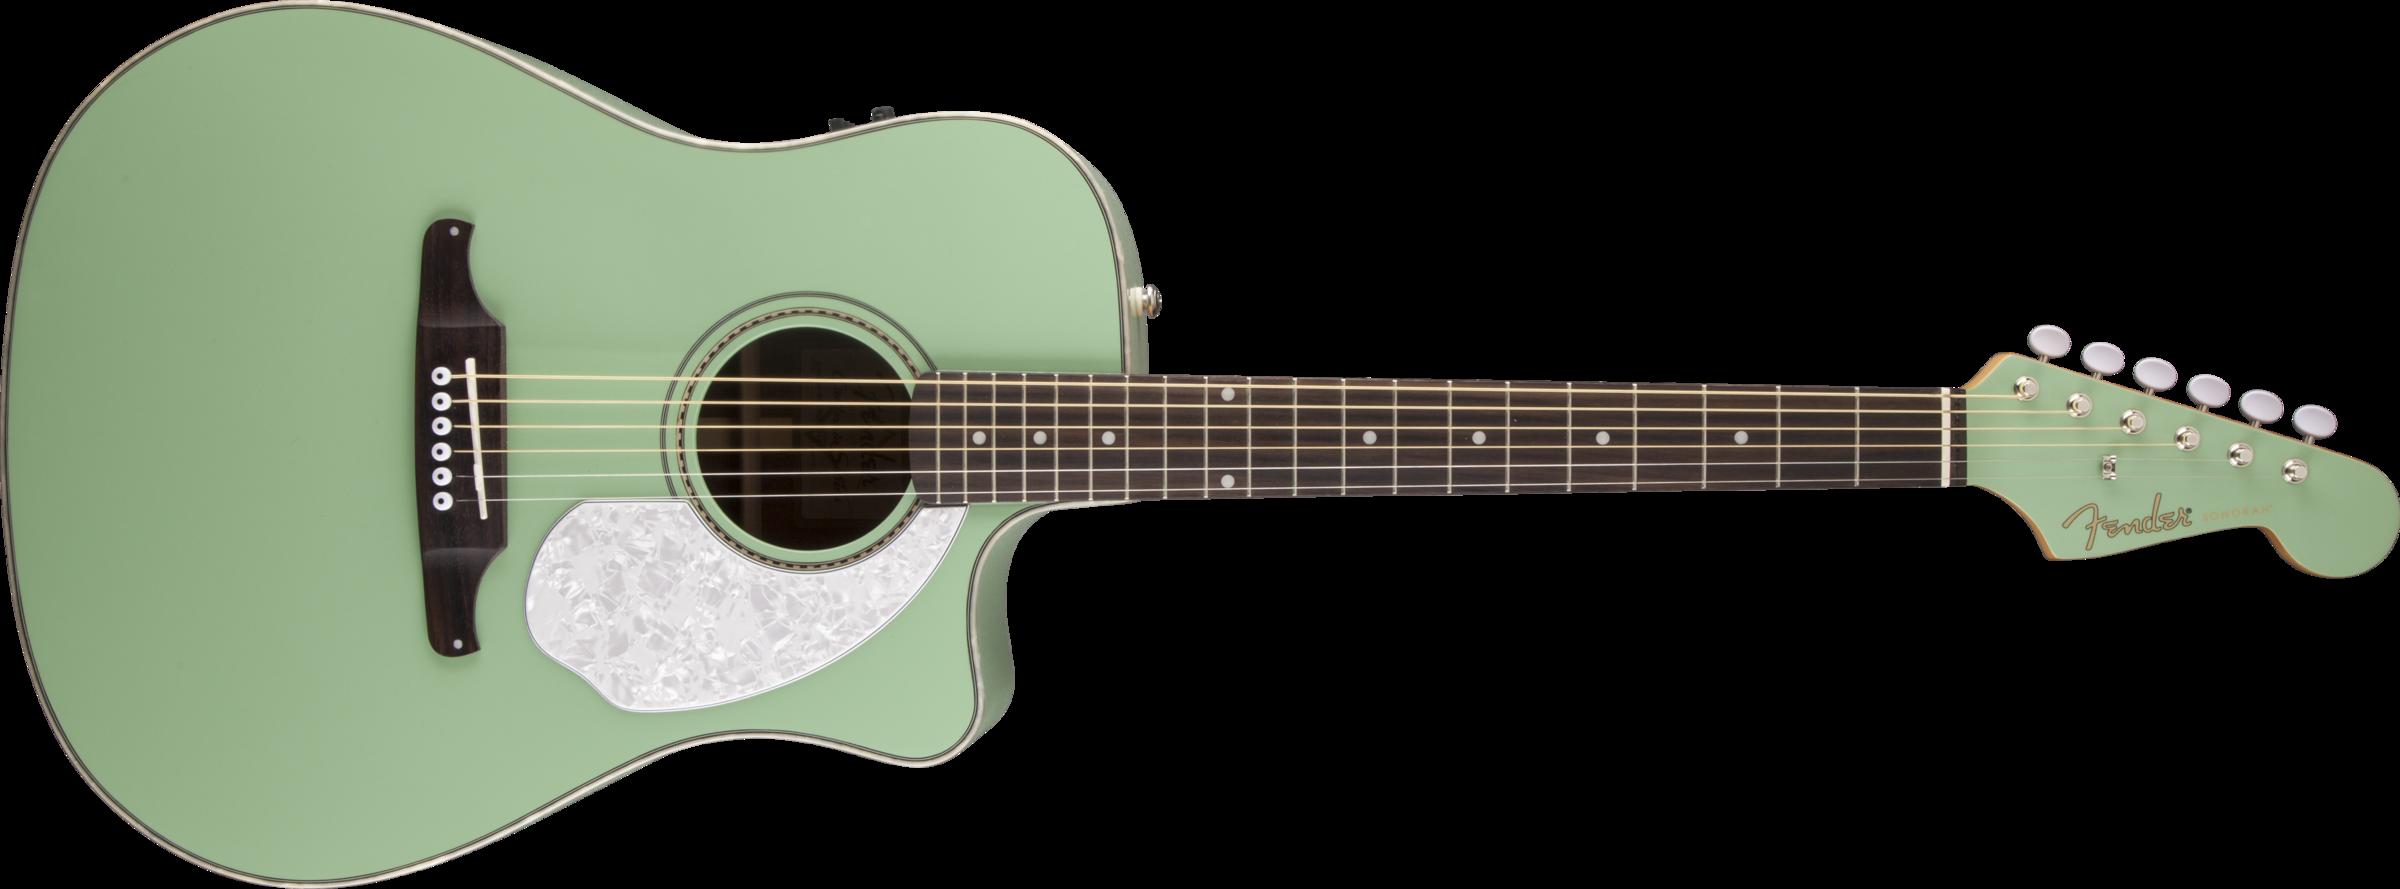 Sites Fender Site Guitar Acoustic Electric Guitar Acoustic Guitar Strings